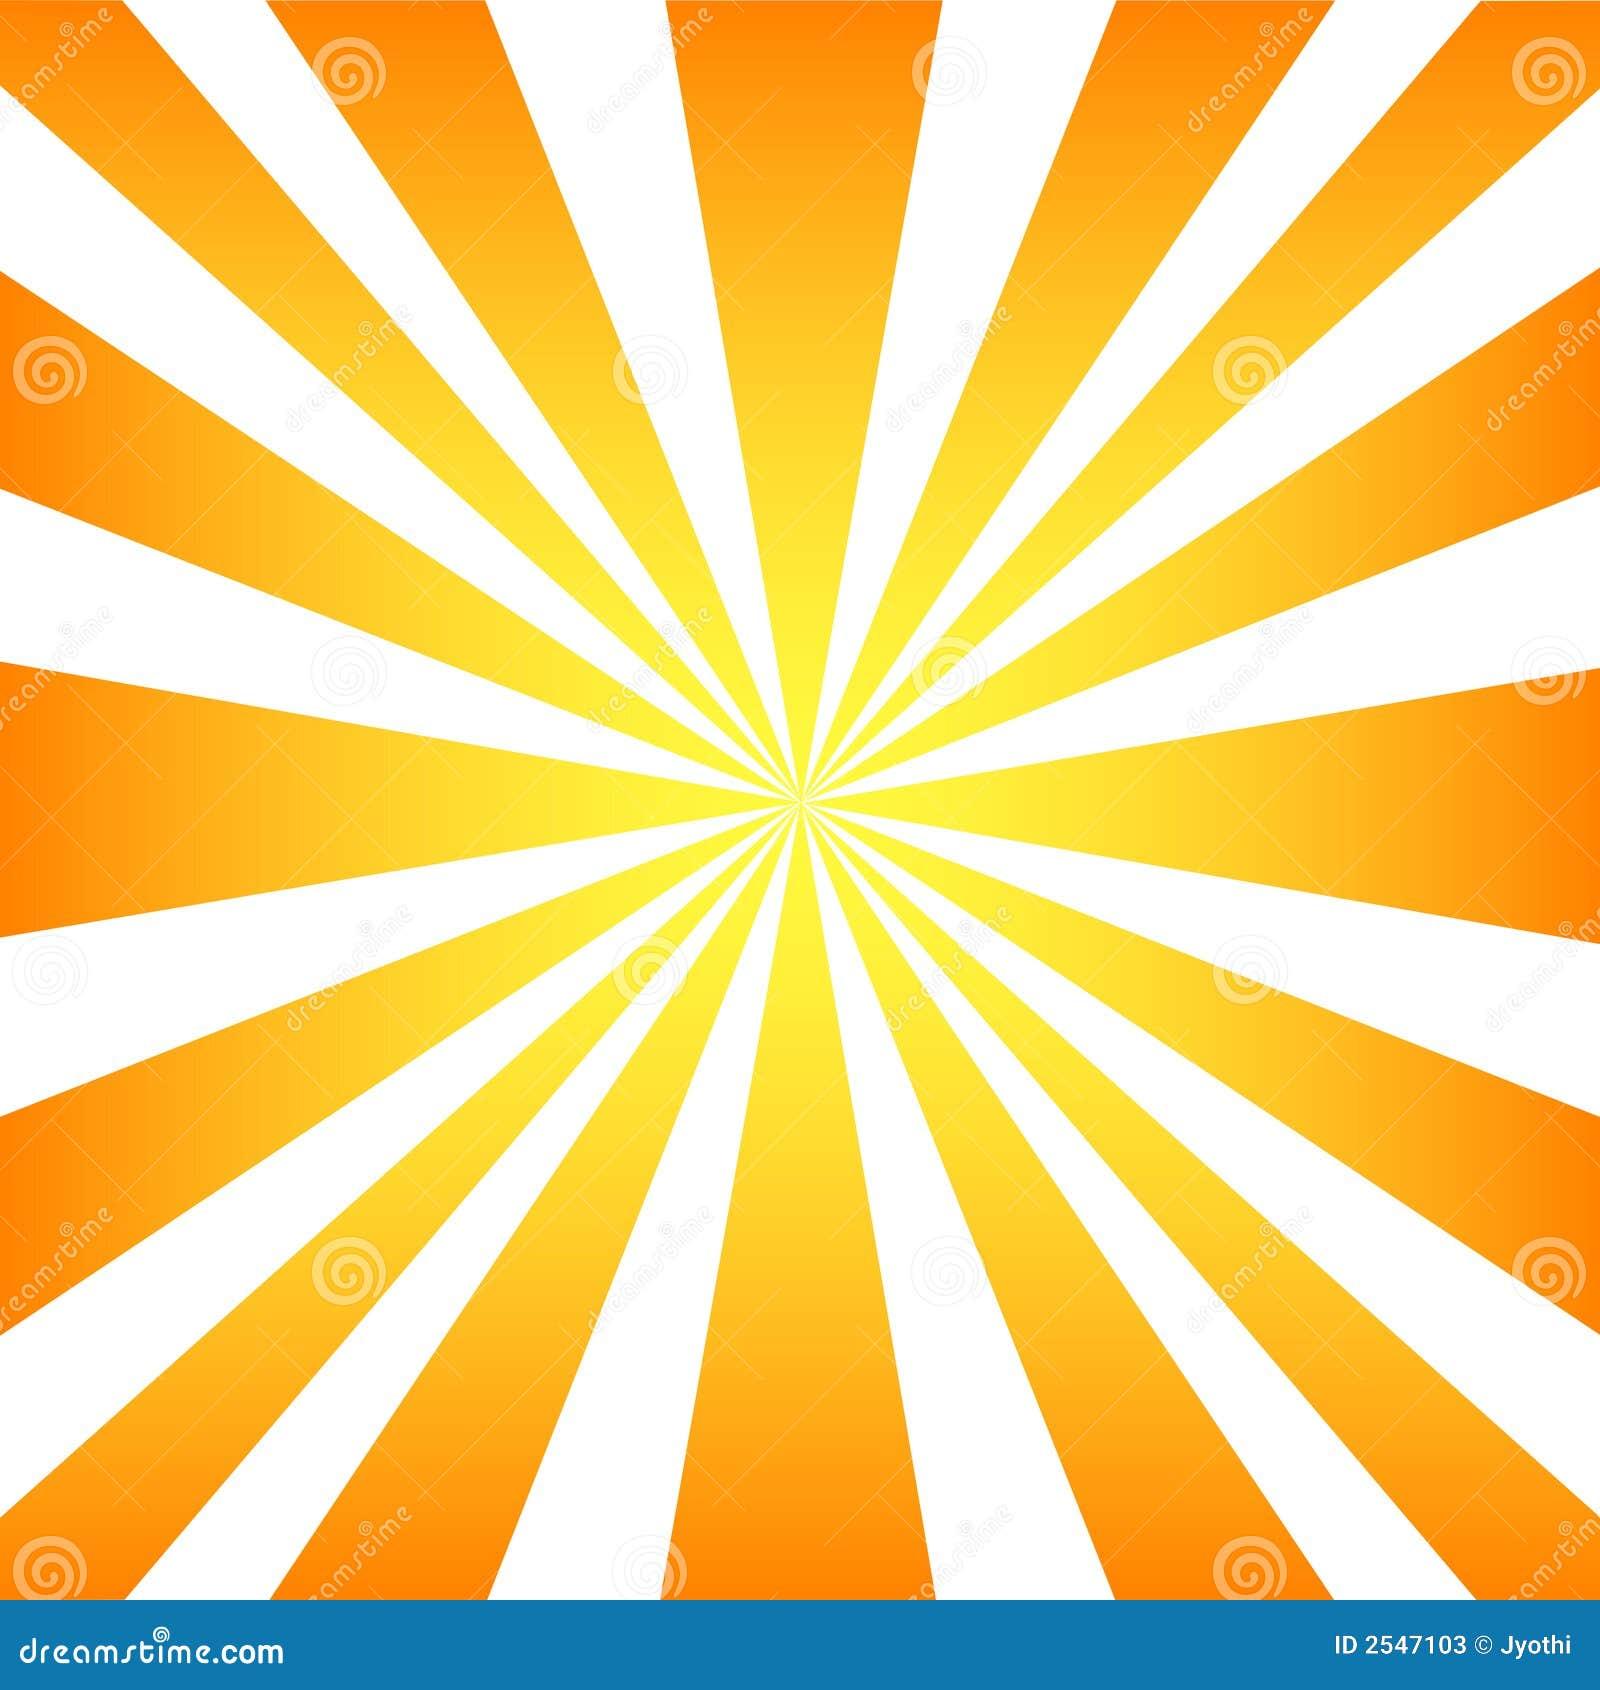 солнце с лучами картинки